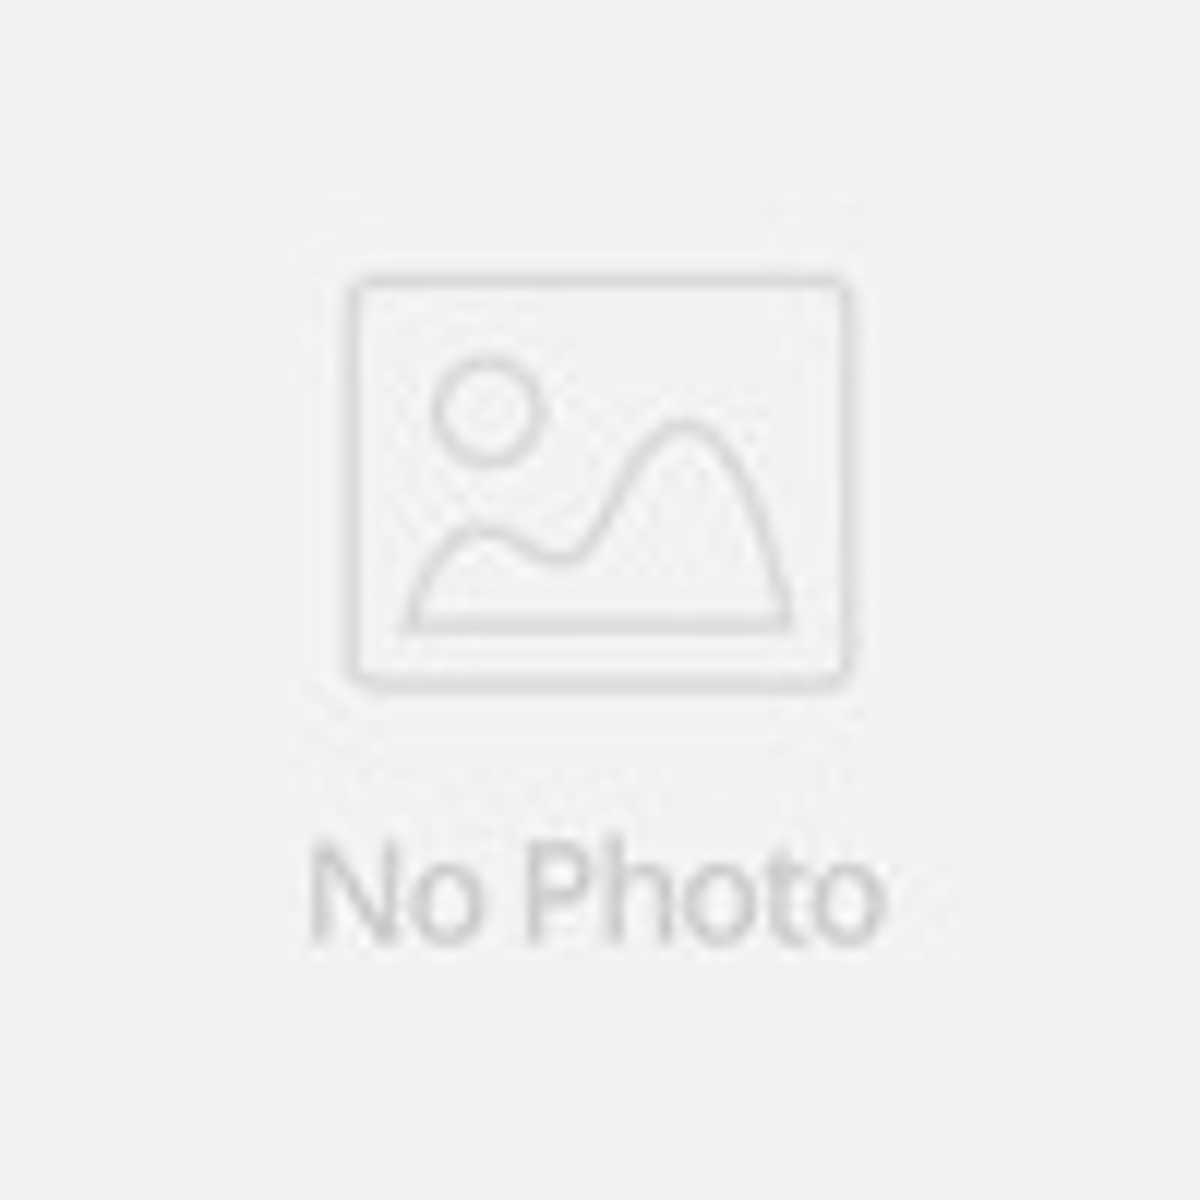 2015 new meter spike sunglasses, vintage sunglasses Europe surges round glasses. [S112](China (Mainland))